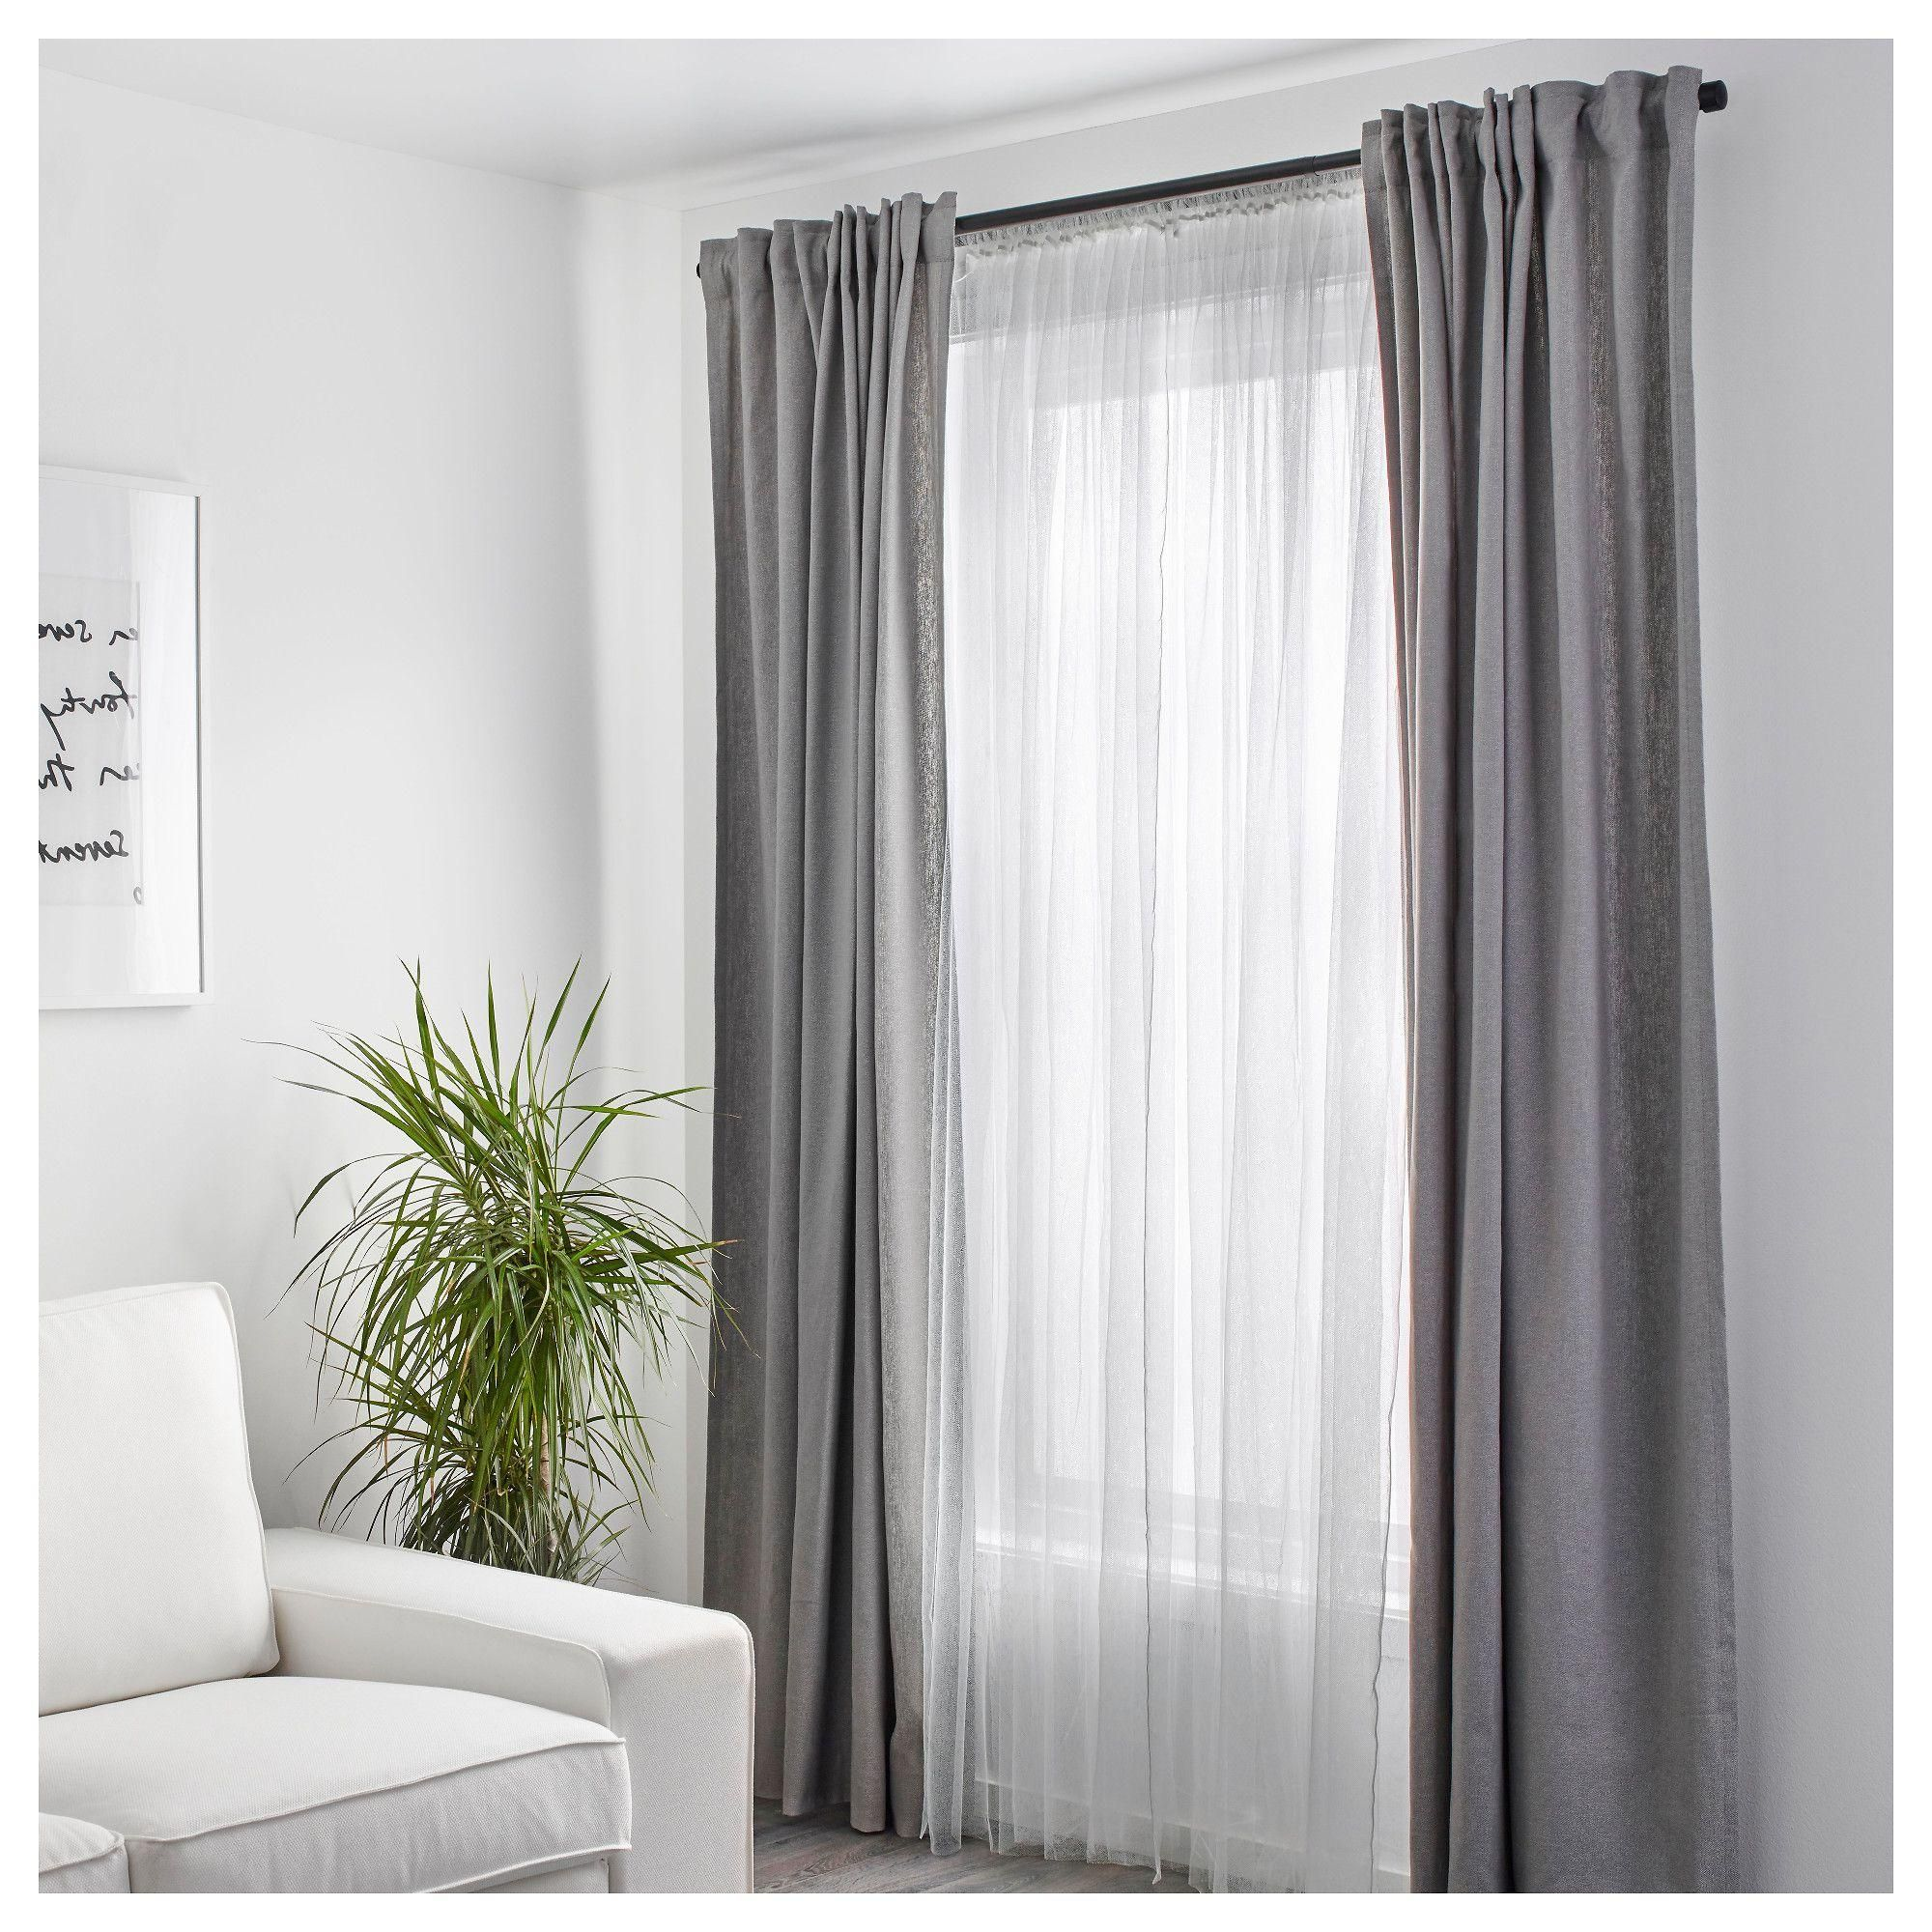 Lill Gardinen Paar Weiss Ikea Zahra Style In 2020 Gardinen Wohnzimmer Modern Wohnung Wohnzimmer Wohnung Gestalten